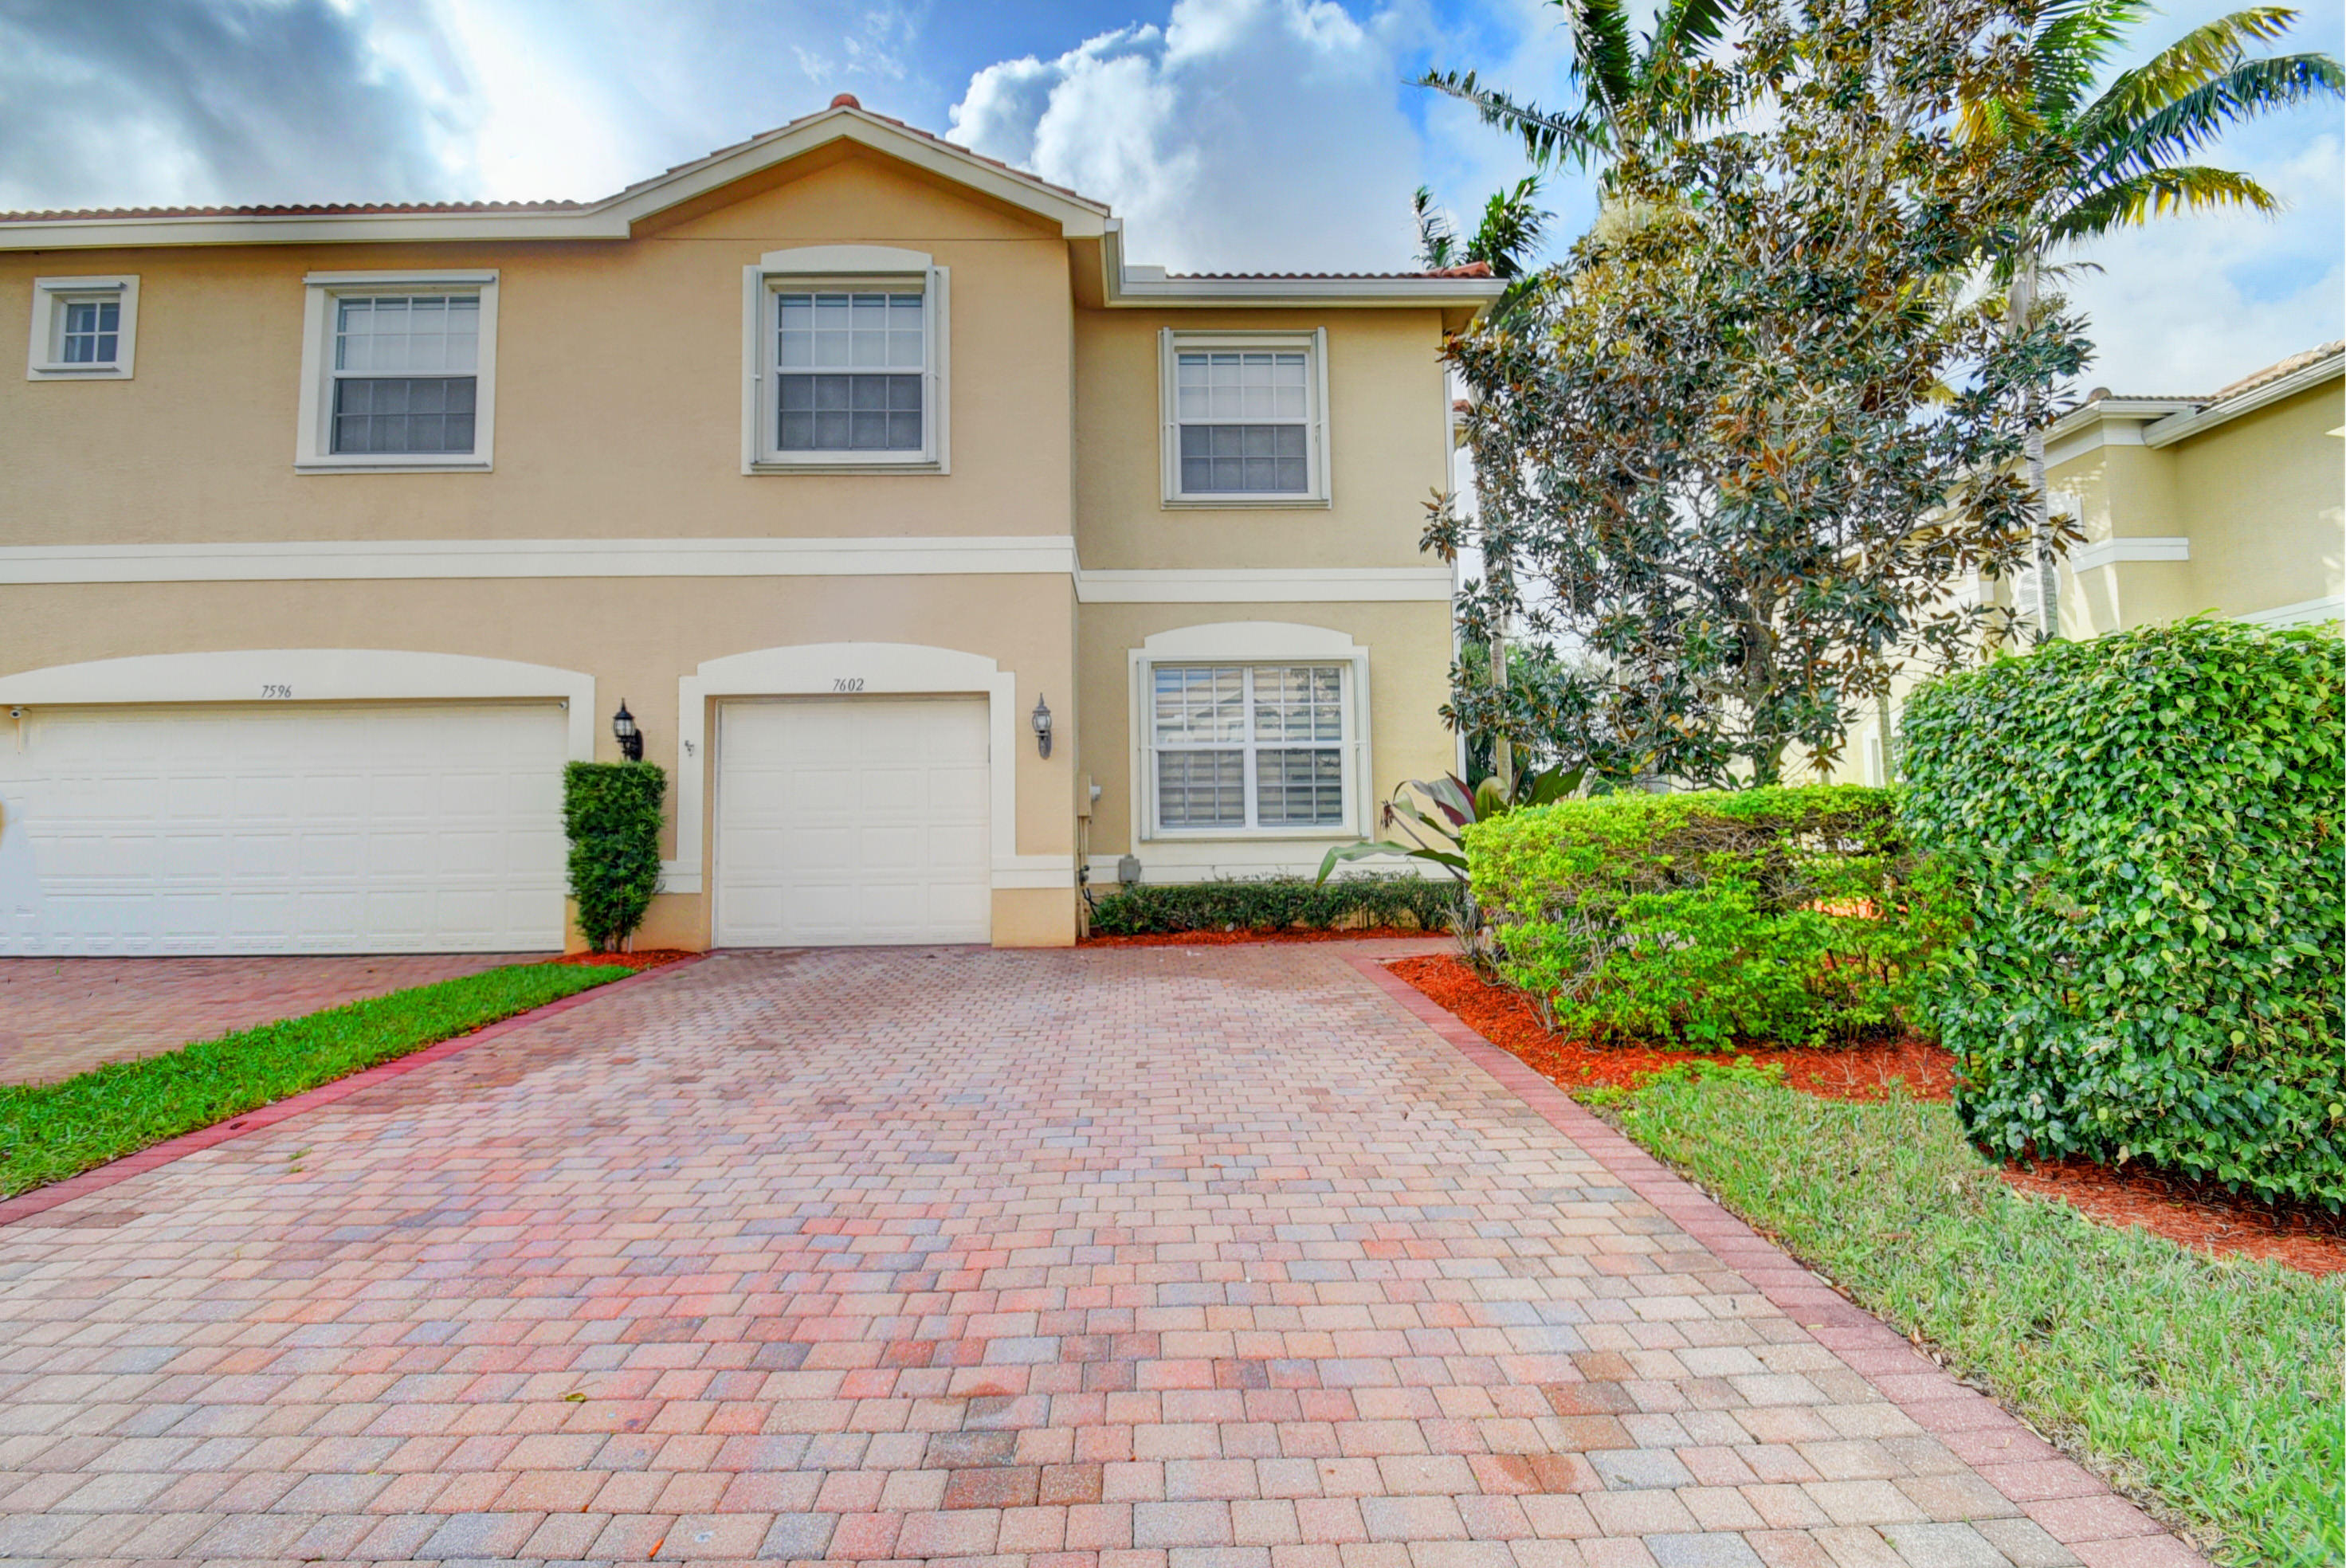 7602 Spatterdock Drive Boynton Beach, FL 33437